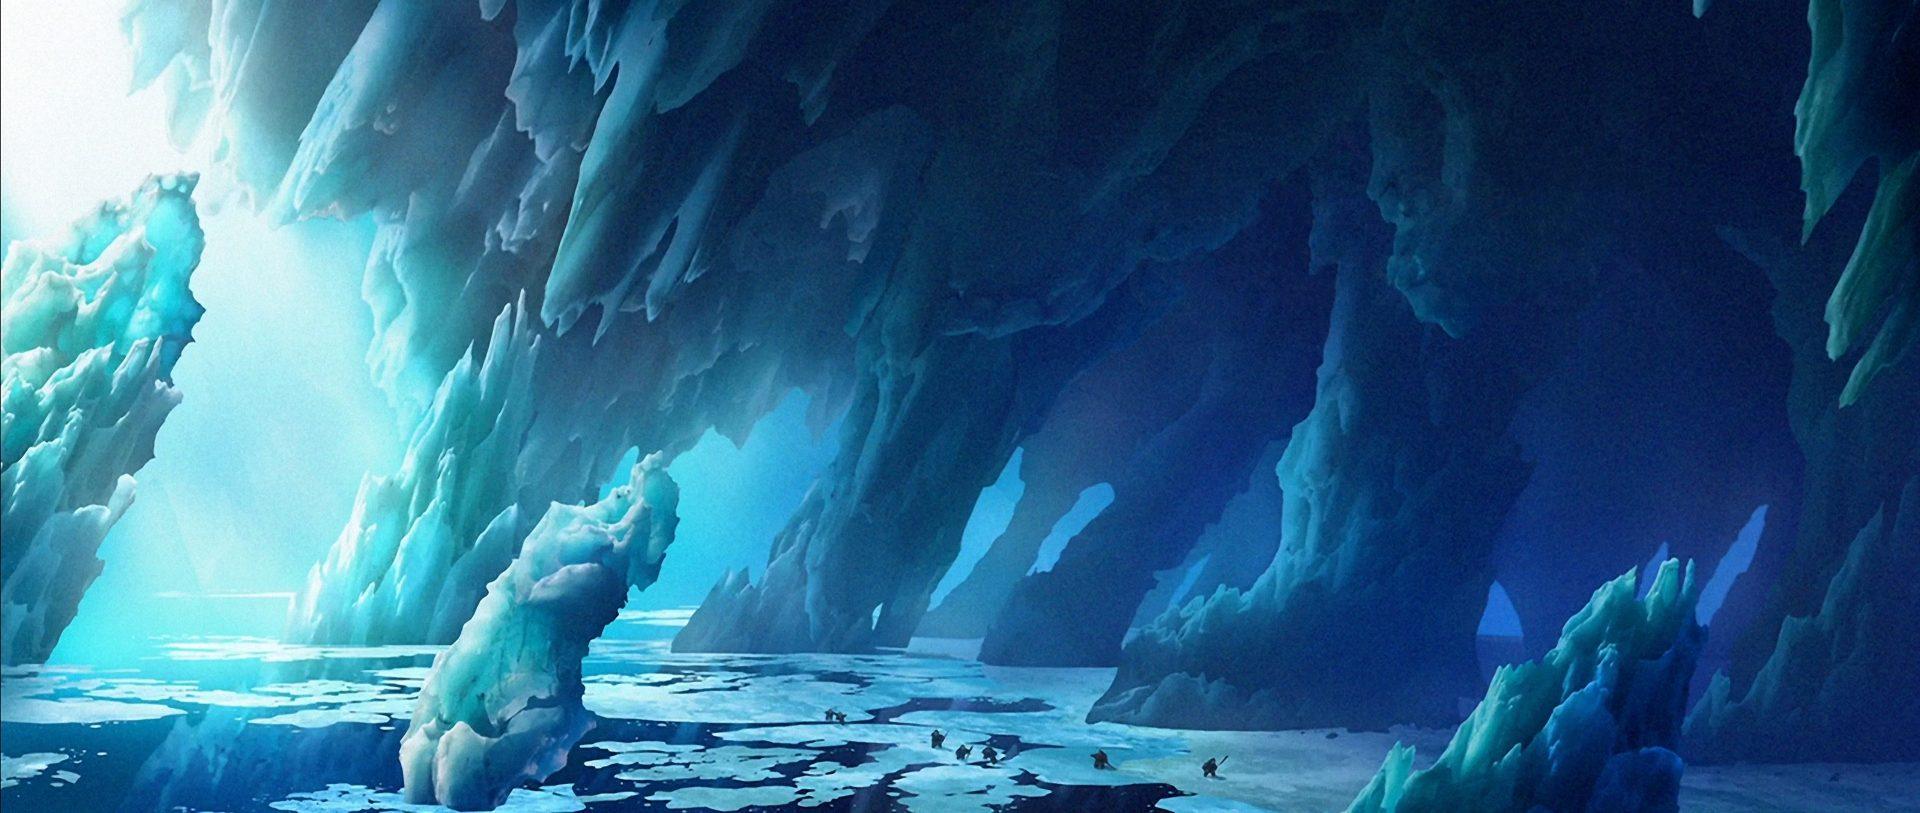 Fall Desktop Mountain Wallpaper How To Train Your Dragon 2 High Definition Concept Art